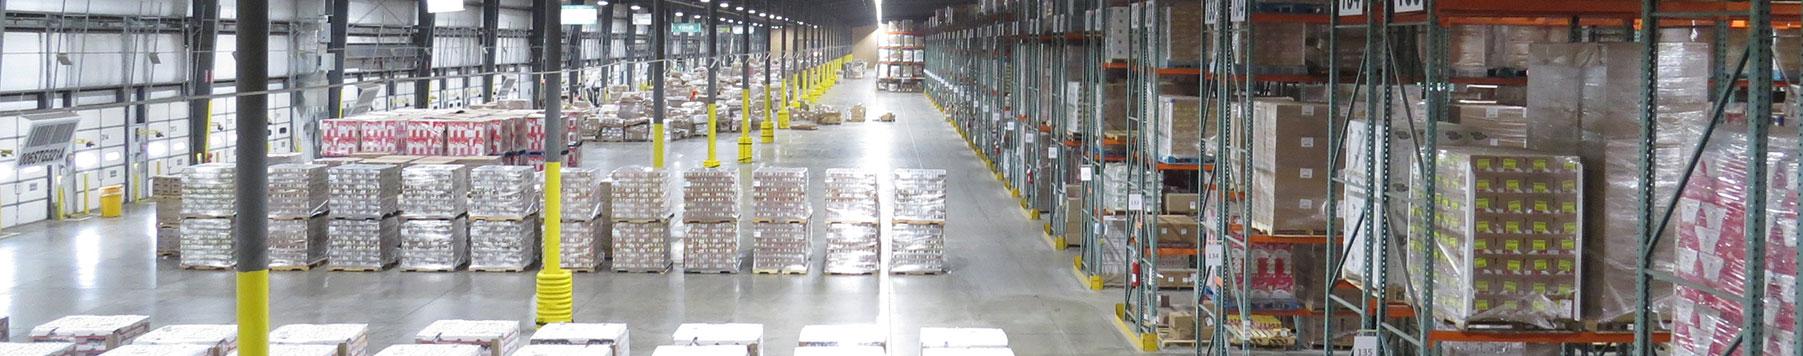 shared-warehousing-banner.jpg